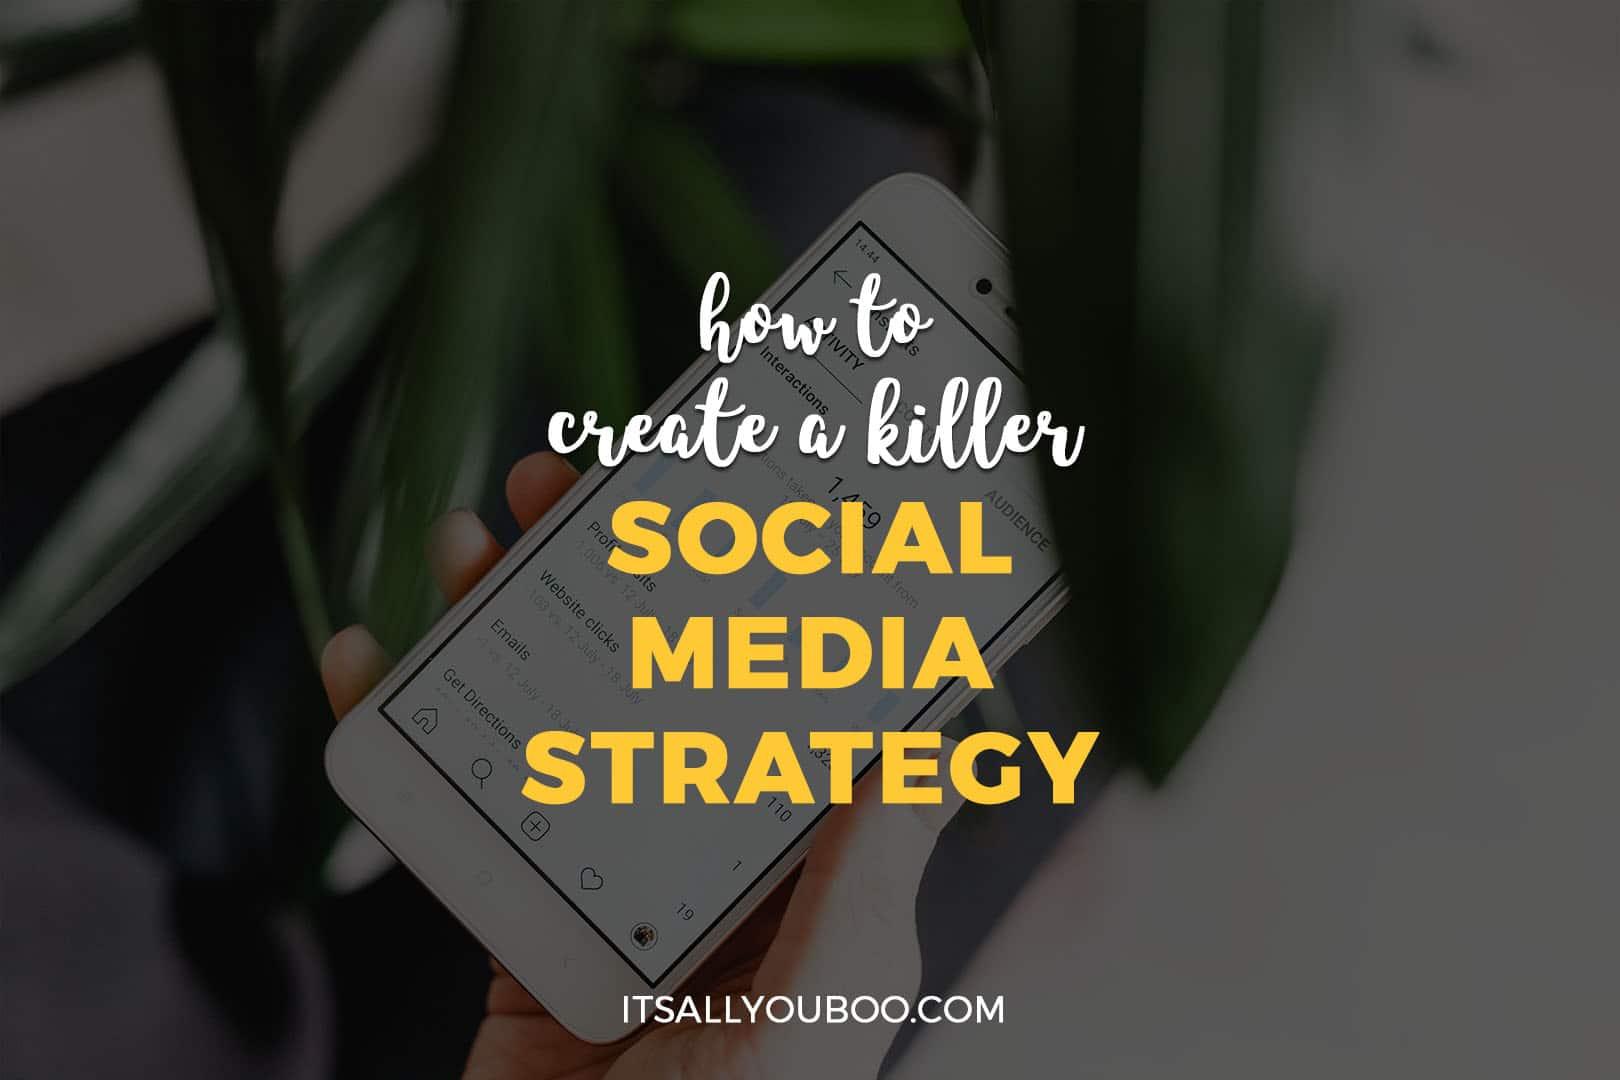 How to Create a Killer Social Media Strategy